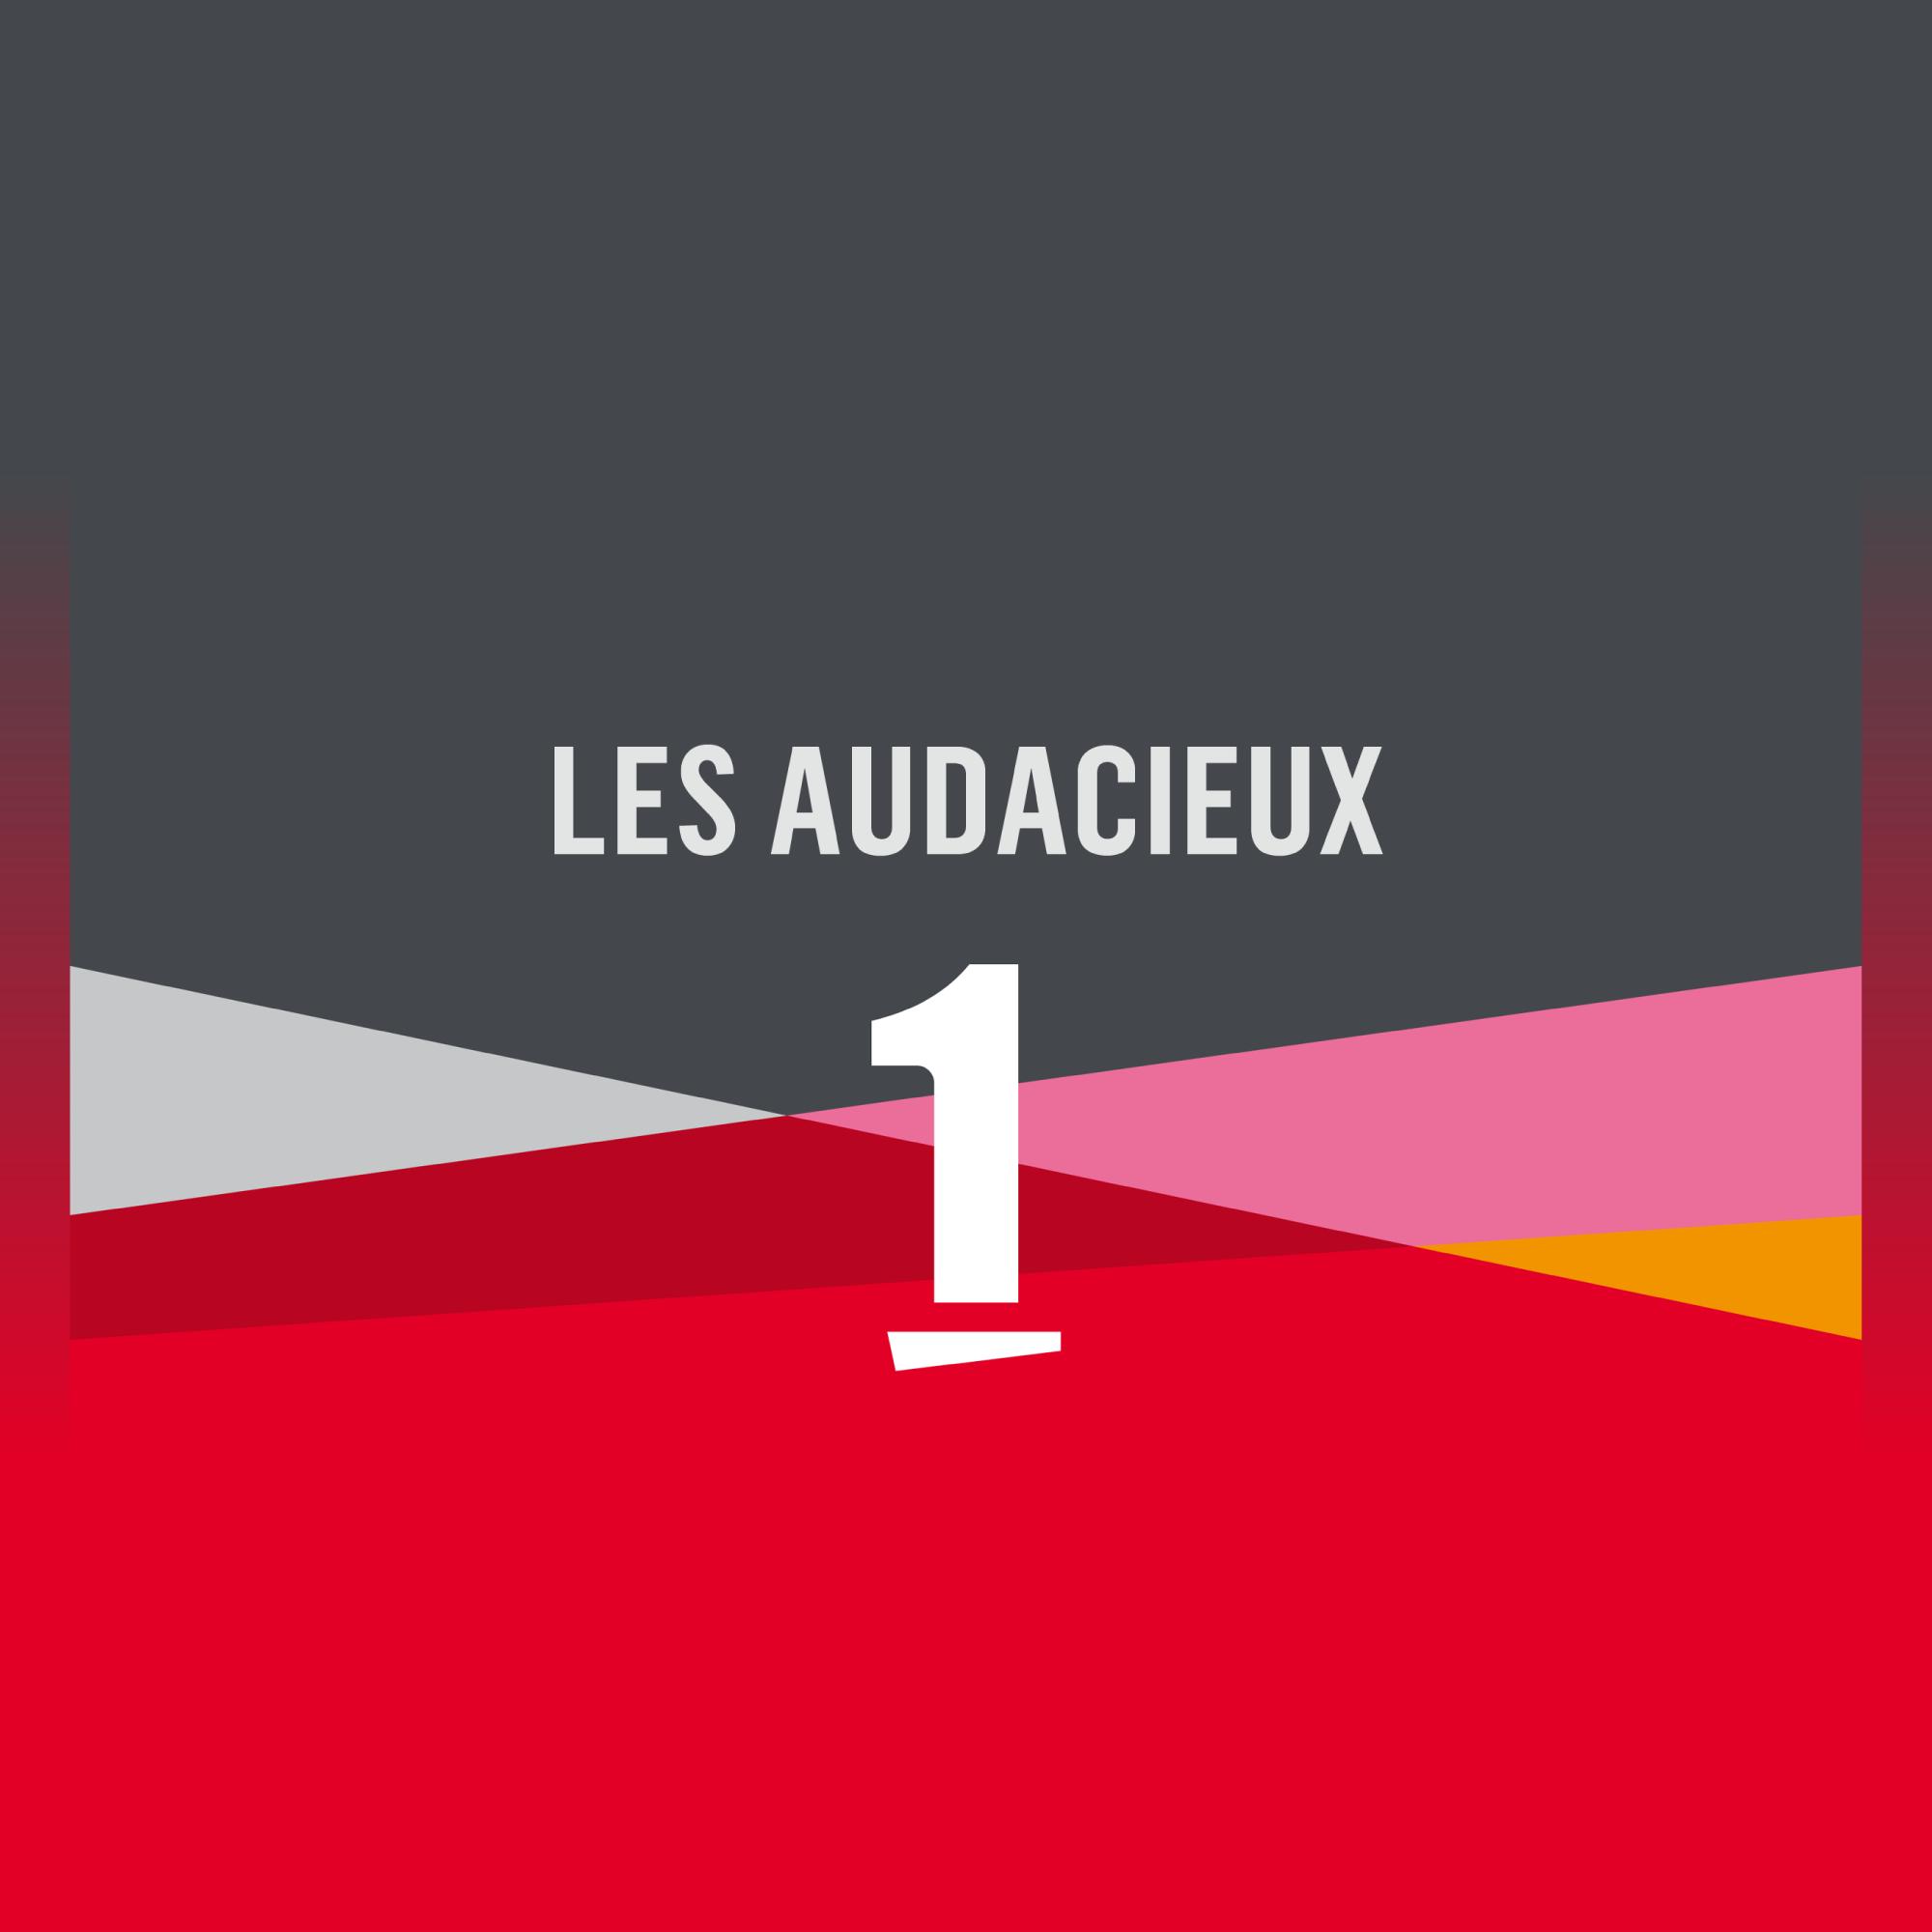 Logo Les audacieux [RTS]